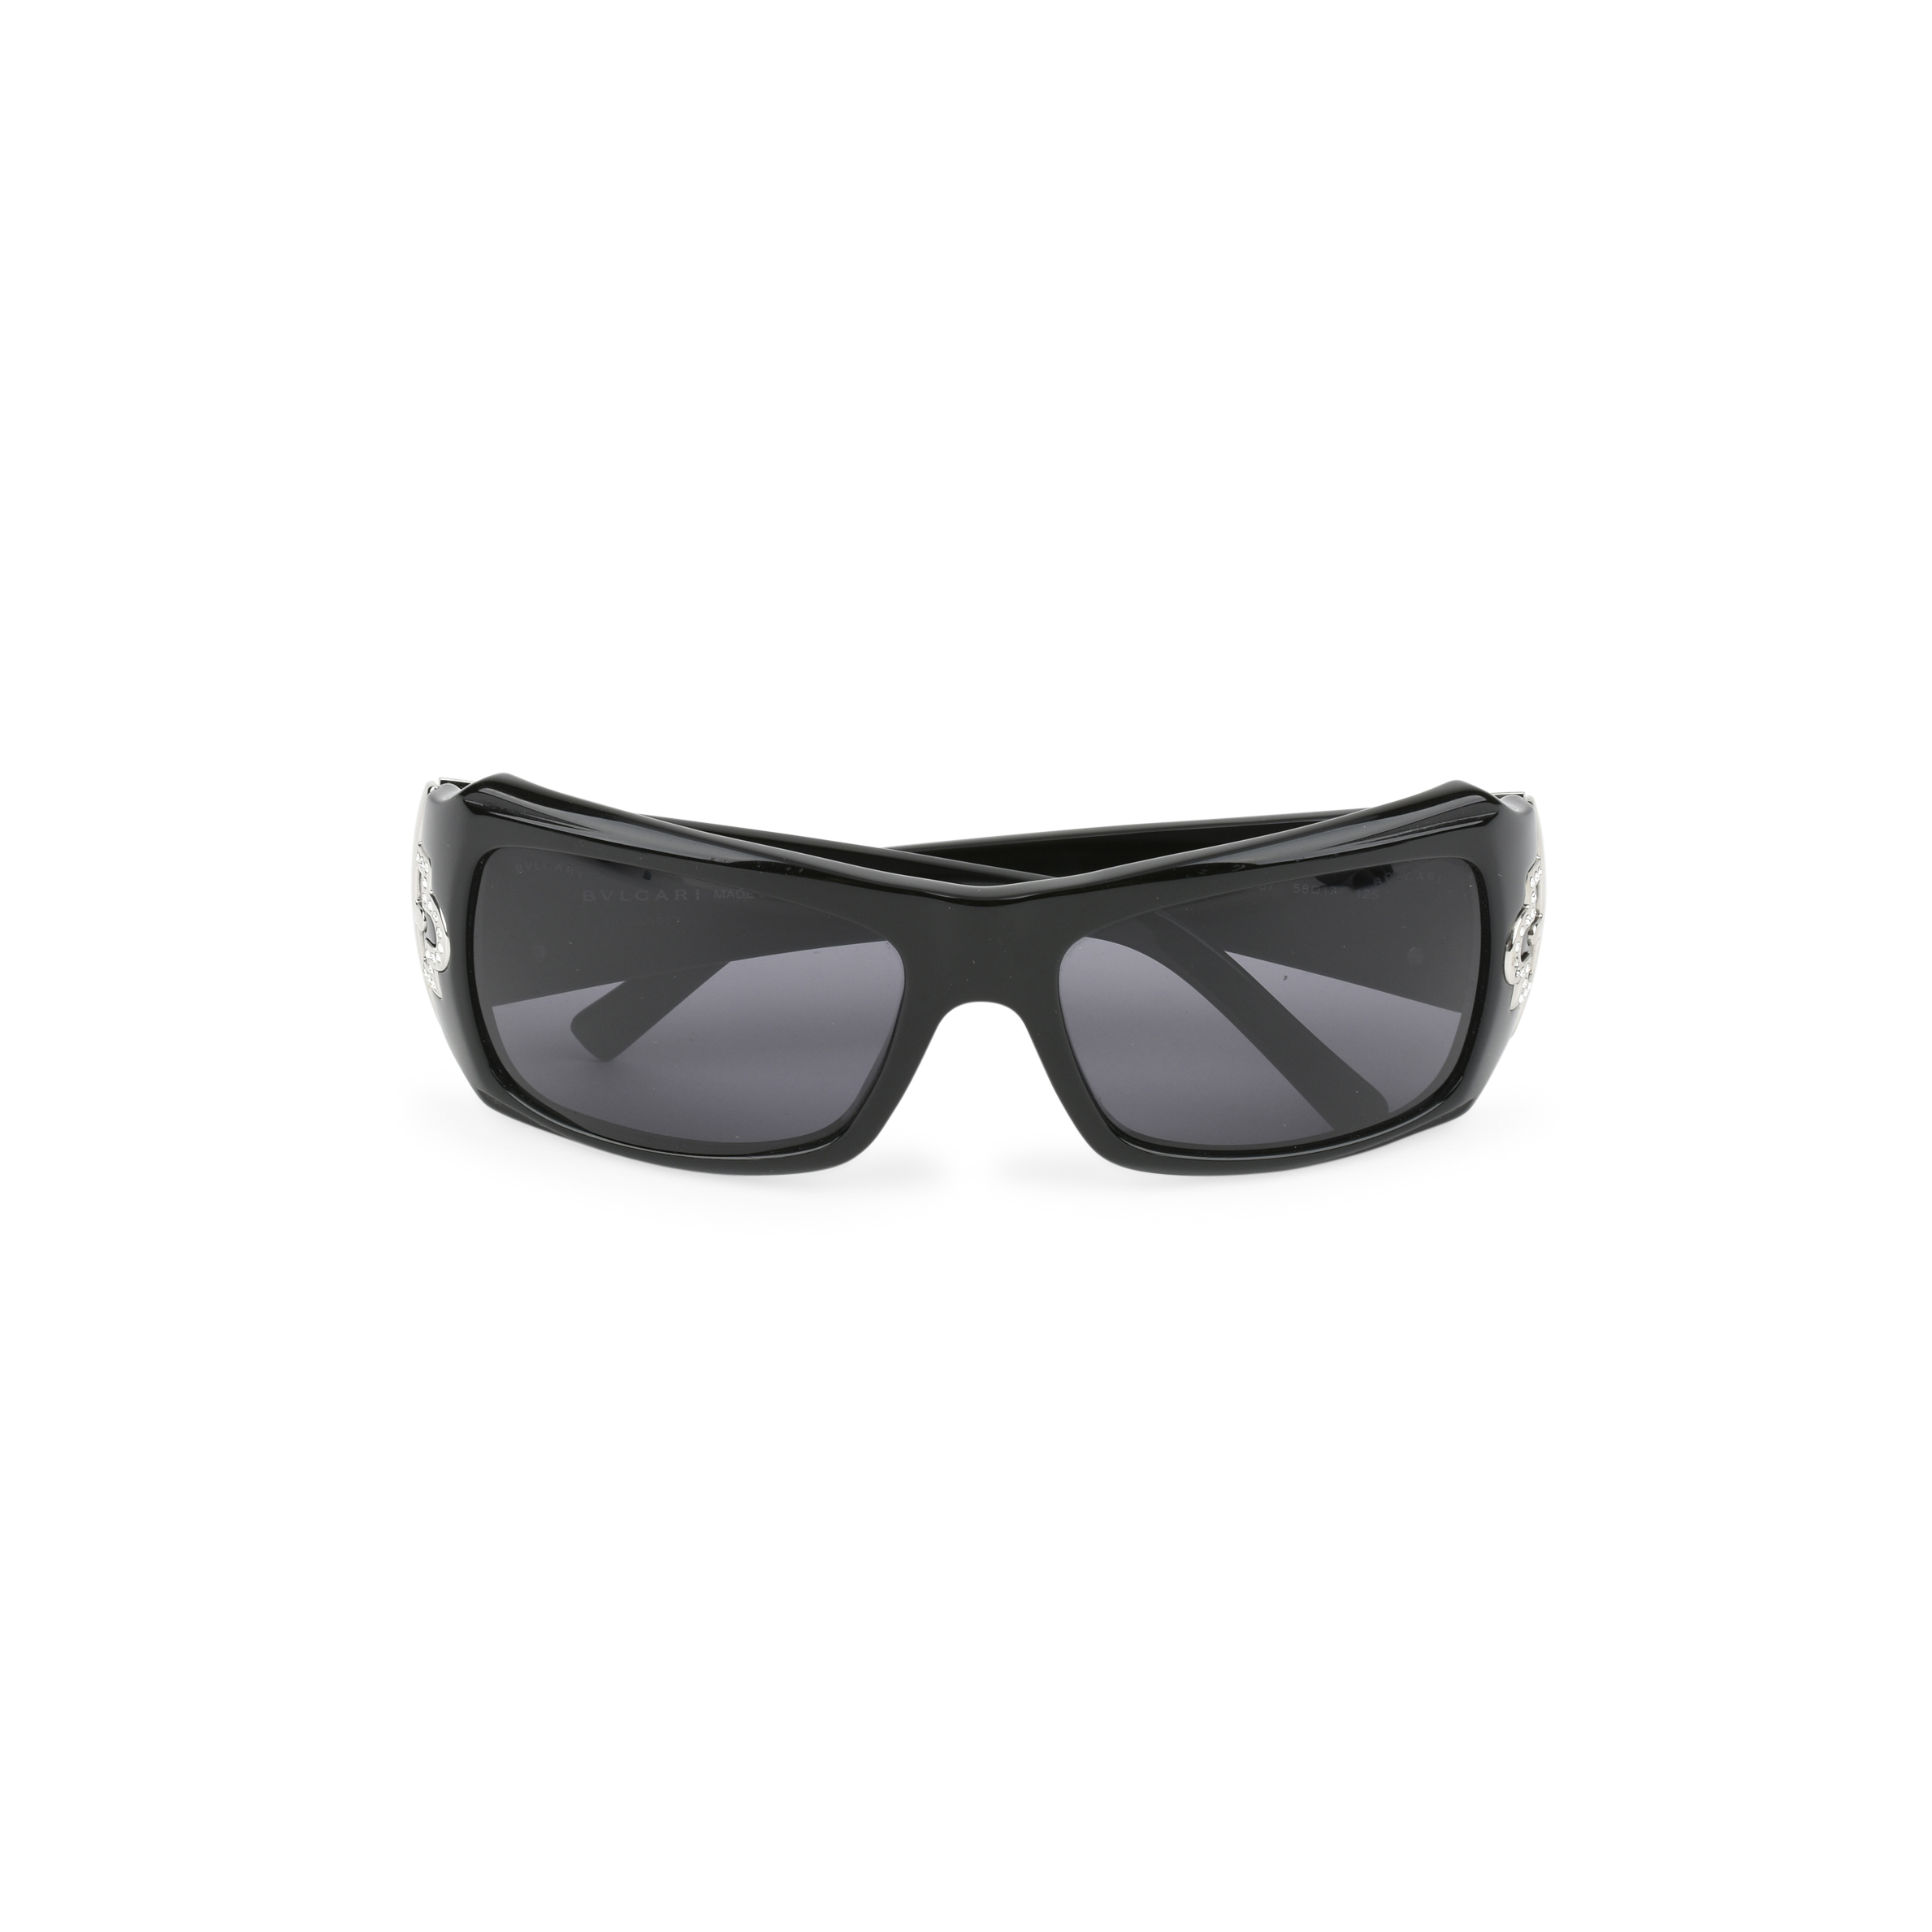 2a228b39b850 Authentic Second Hand Bulgari Jeweled Sunglasses (PSS-436-00024 ...